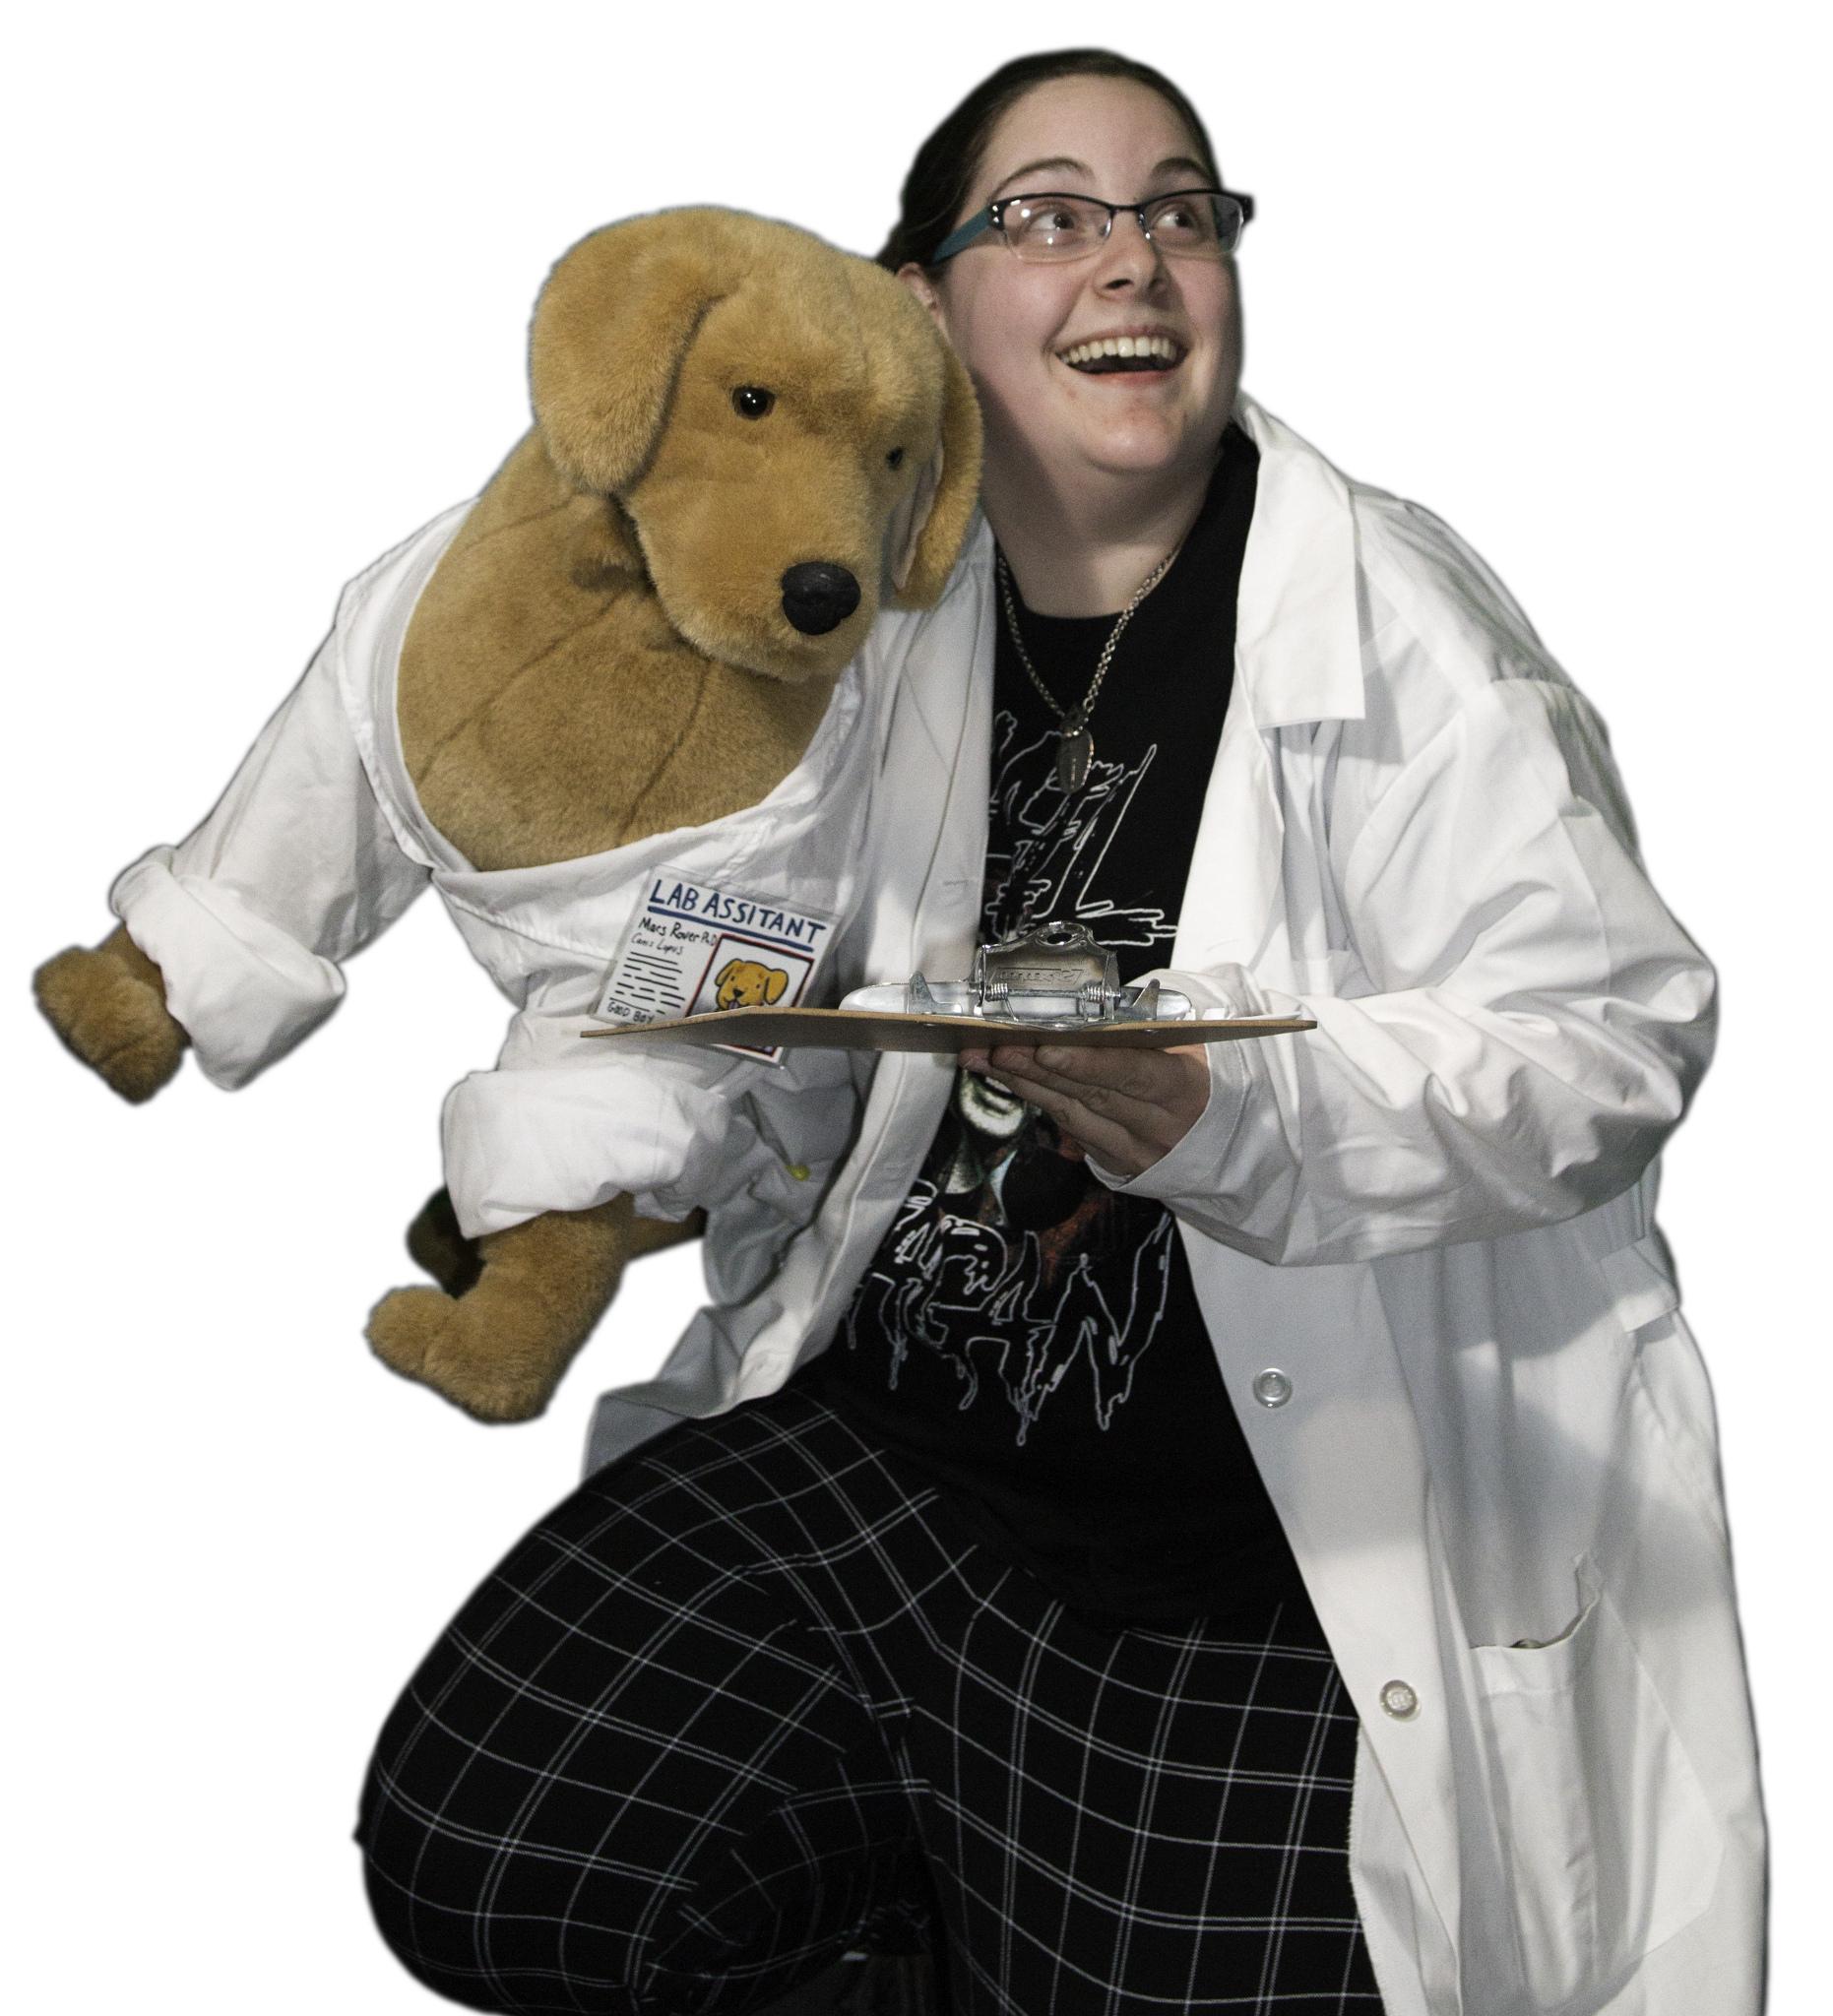 Dr. Professor Hemoglobin MDLMNOP